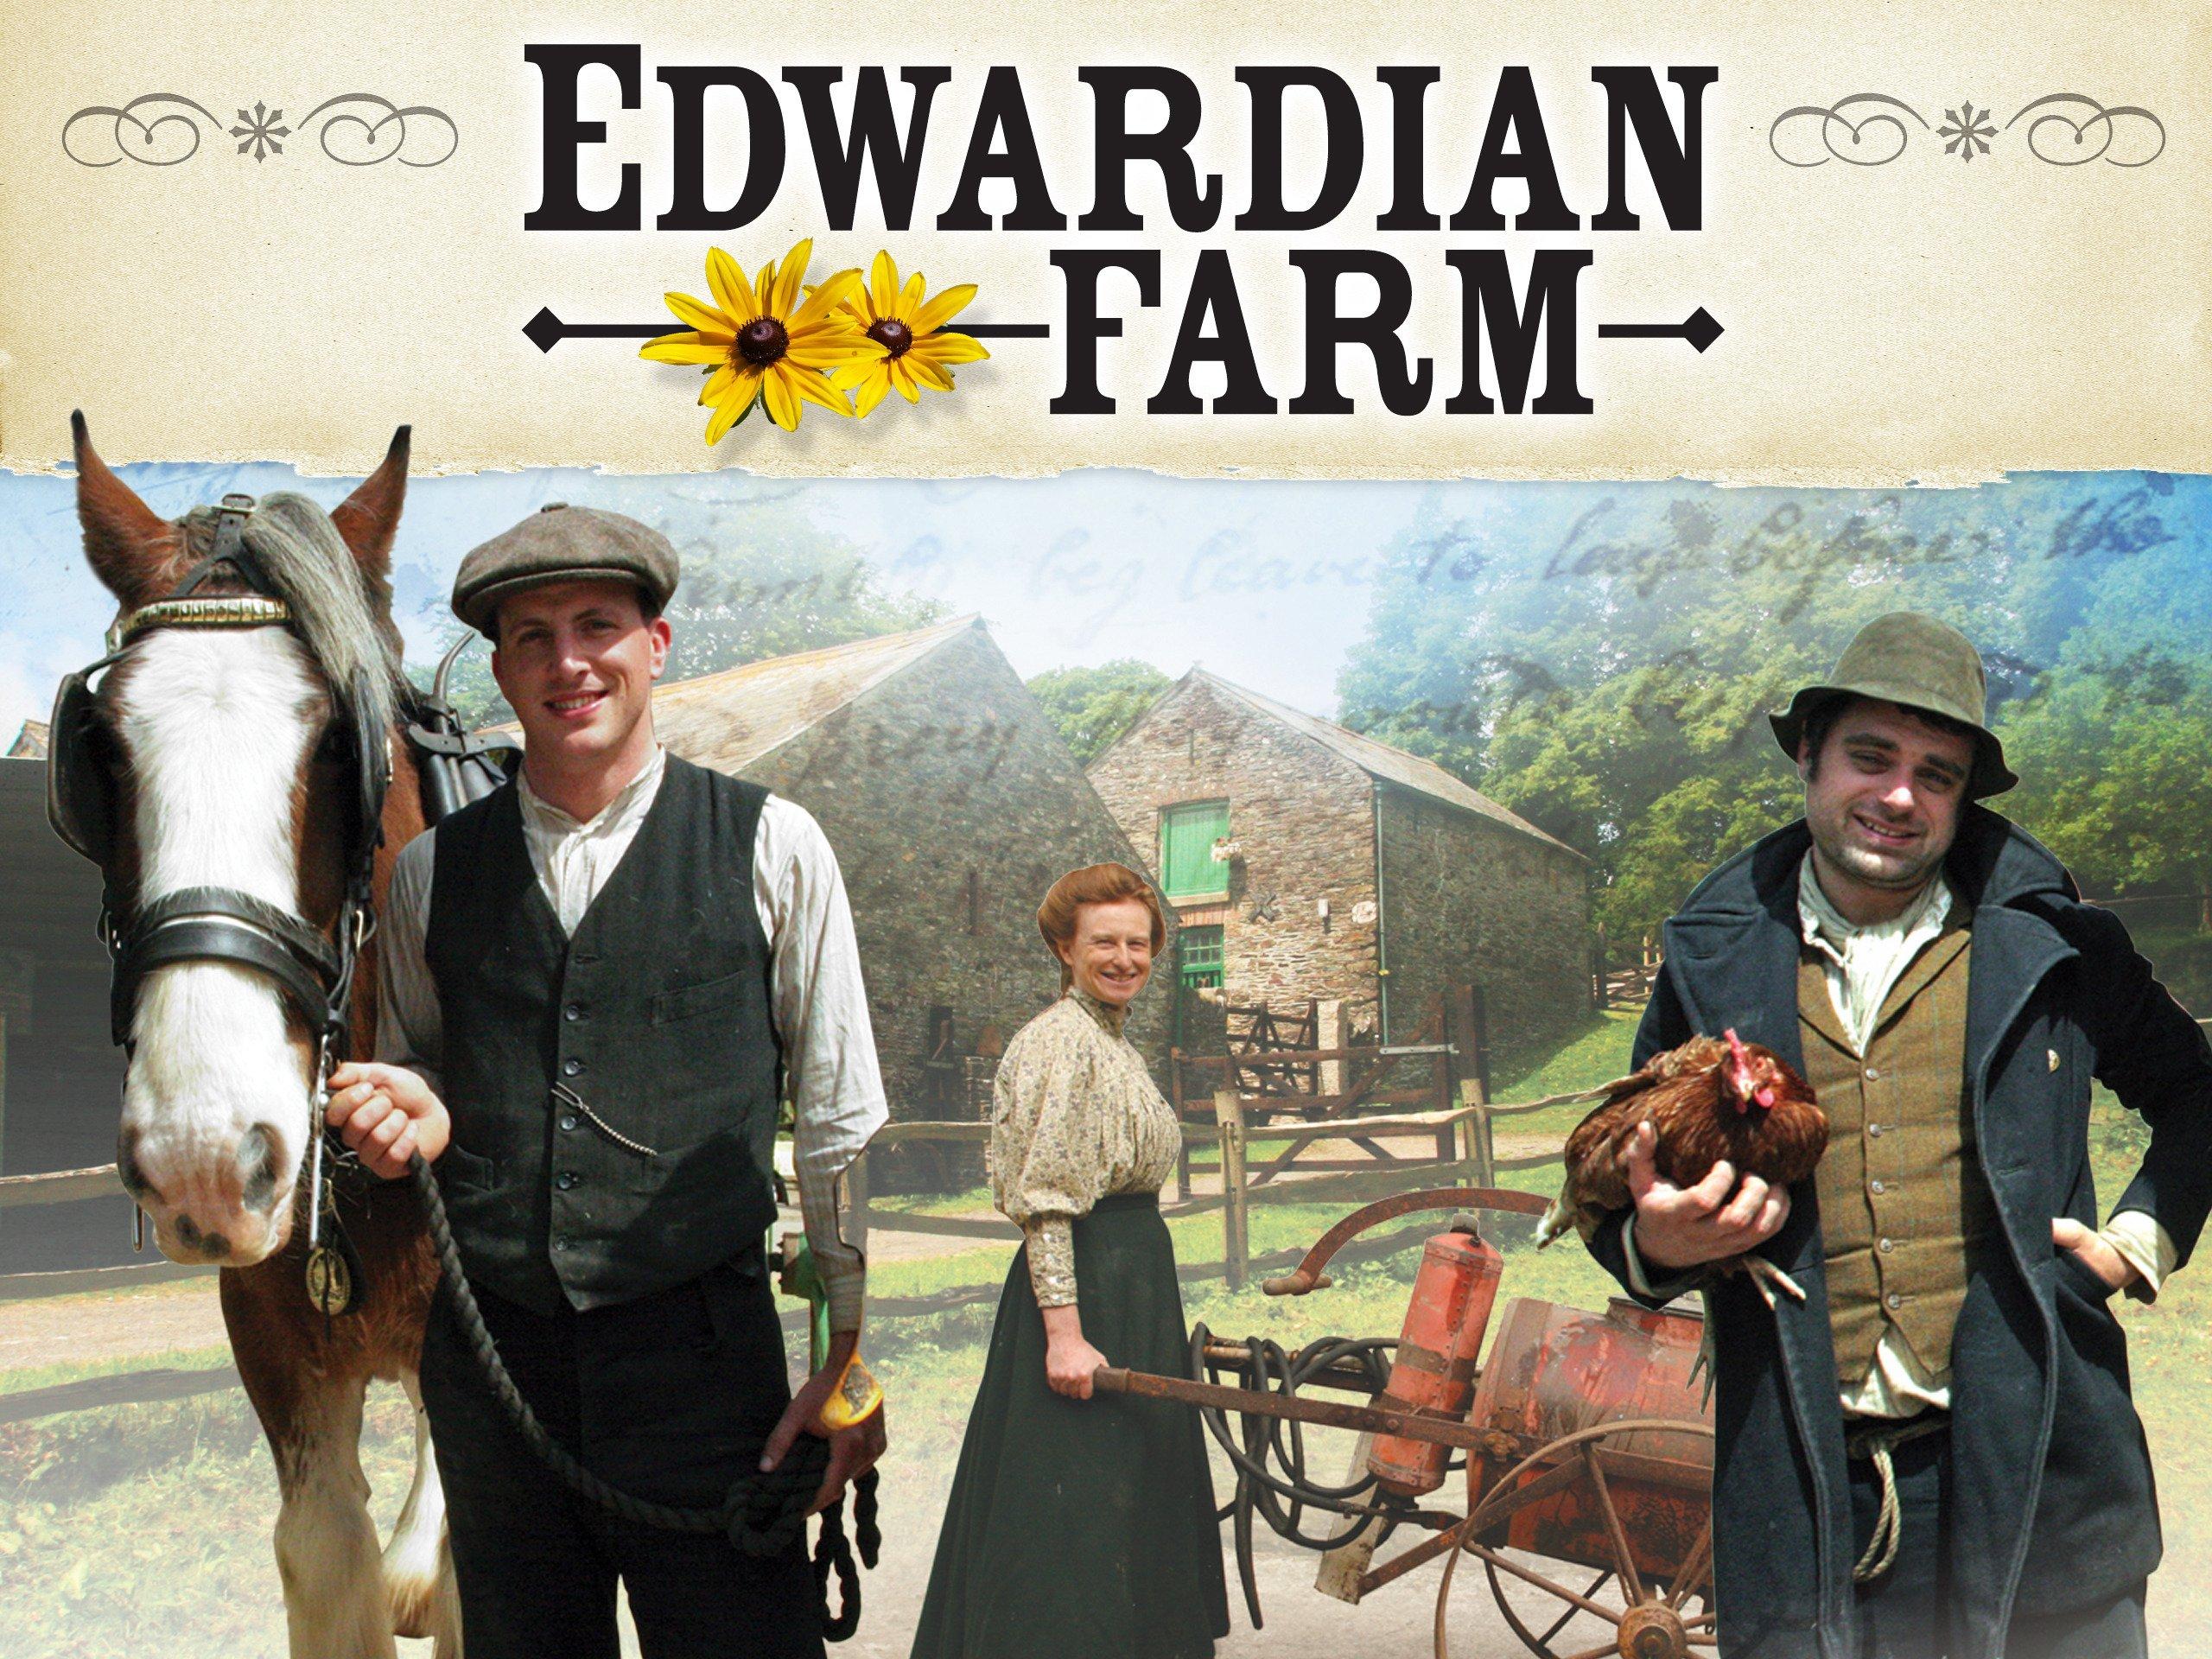 Amazon: Edwardian Farms: Peter Ginn, Ruth Goodman, Alex Langlands,  Rupert Acton, Chris Mitchell, Naomi Benson, Stuart Elliot, Chris Marshall,